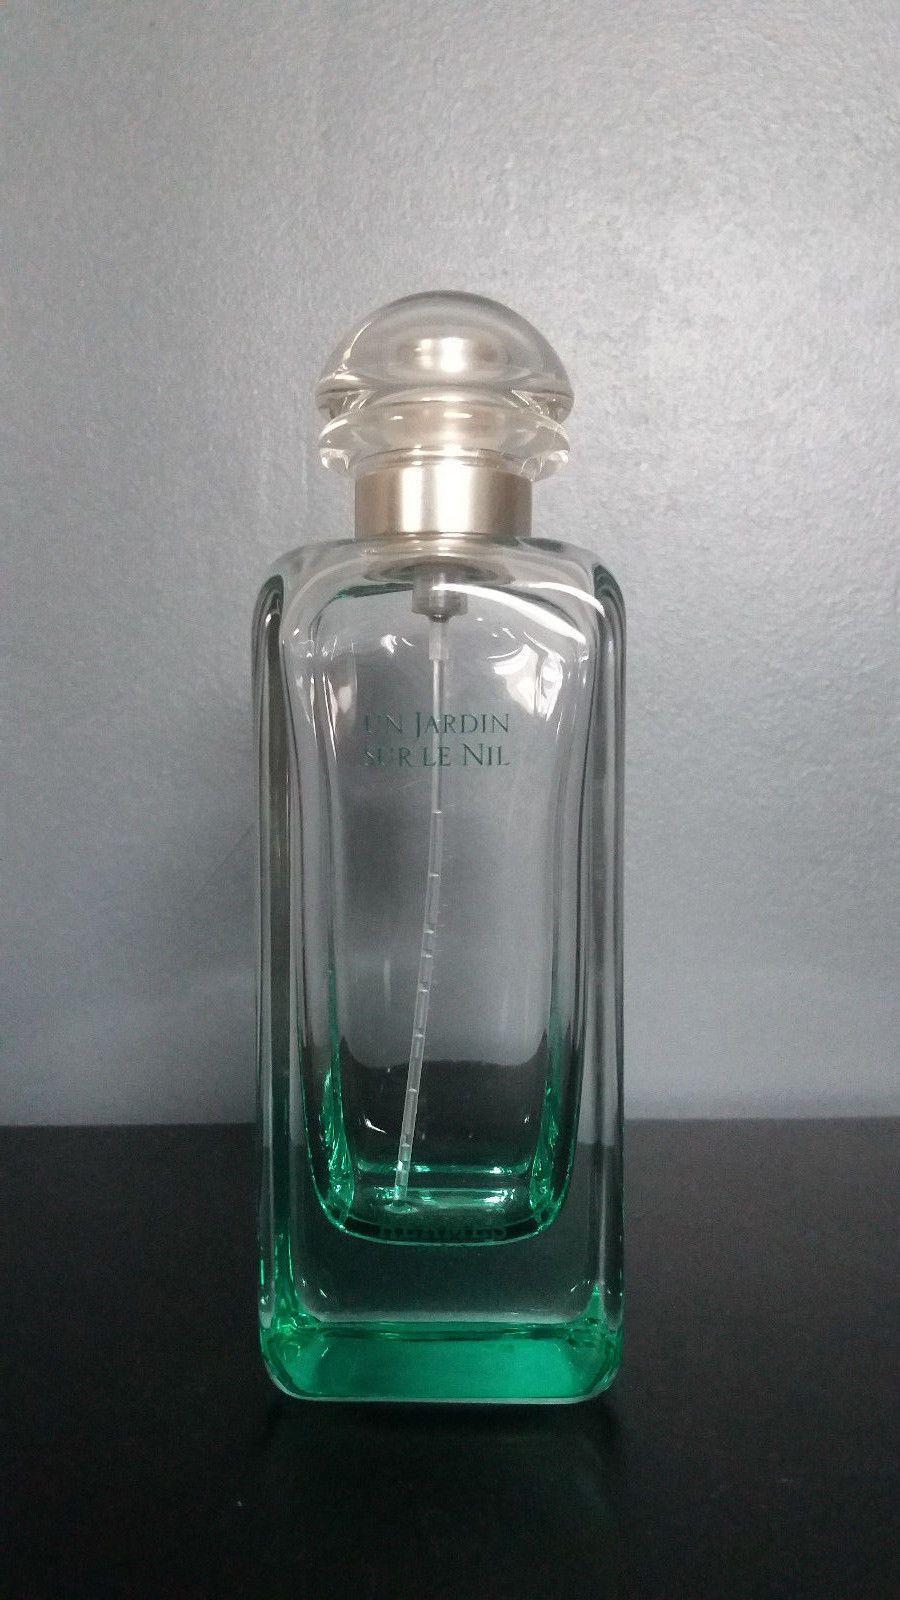 De Vide Le NilHermès Flacon 100mlMa Parfum Sur Jardin Un n0wXkON8P